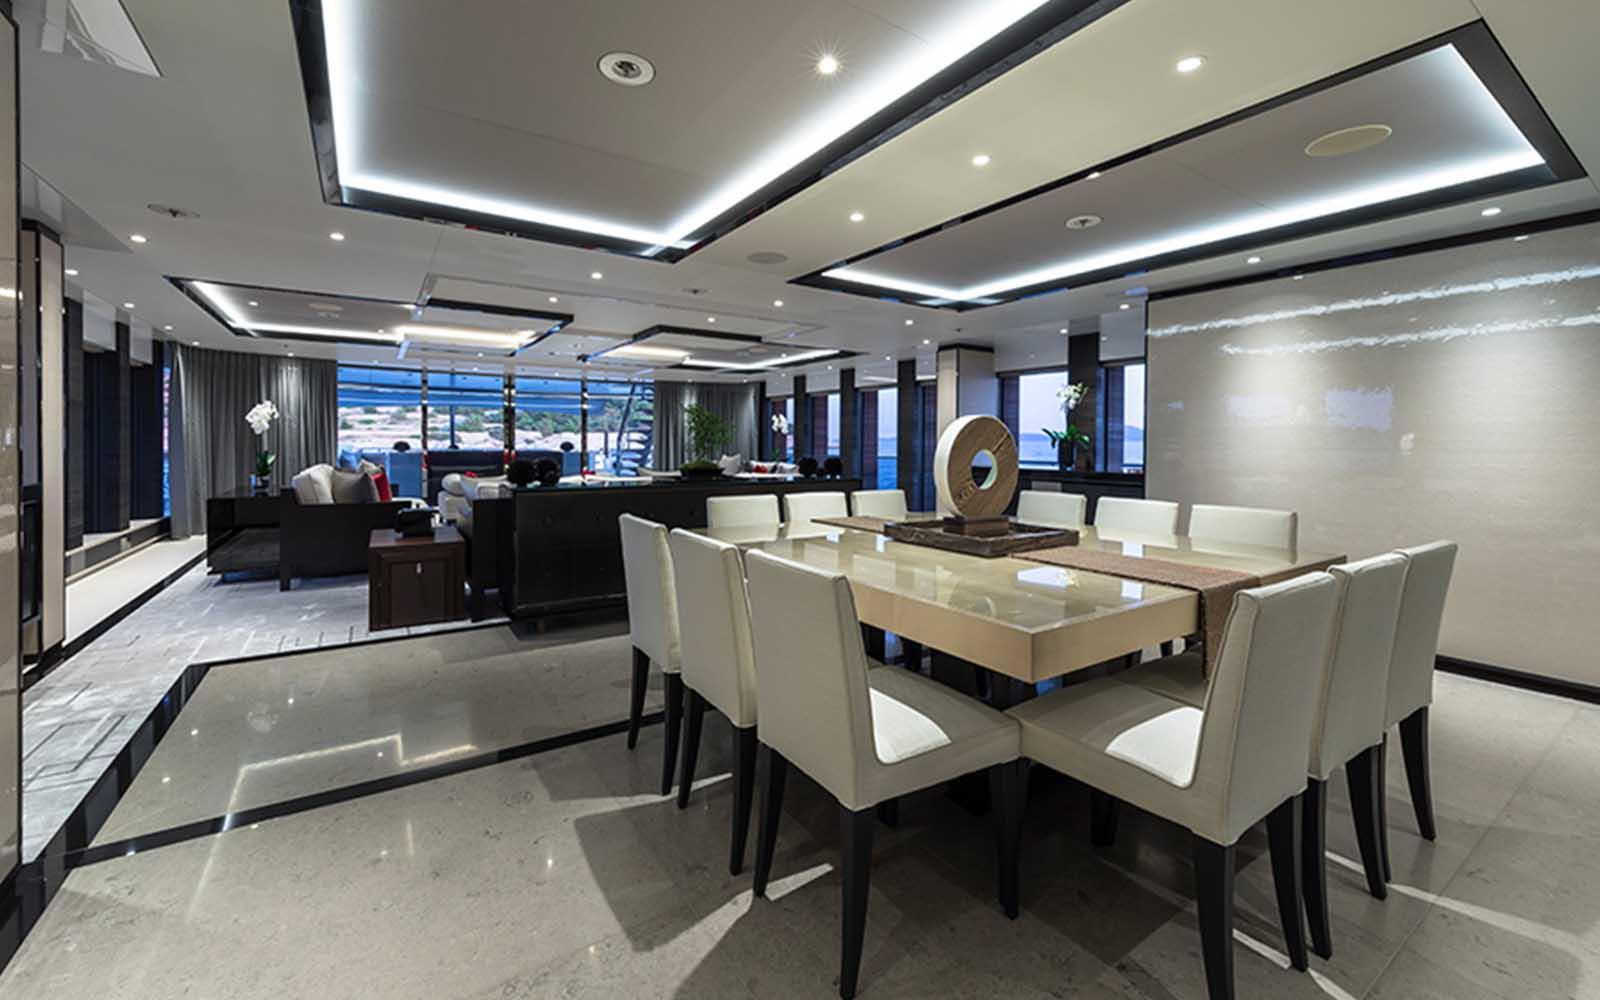 alia yachts superiate samurai - boat shopping 2